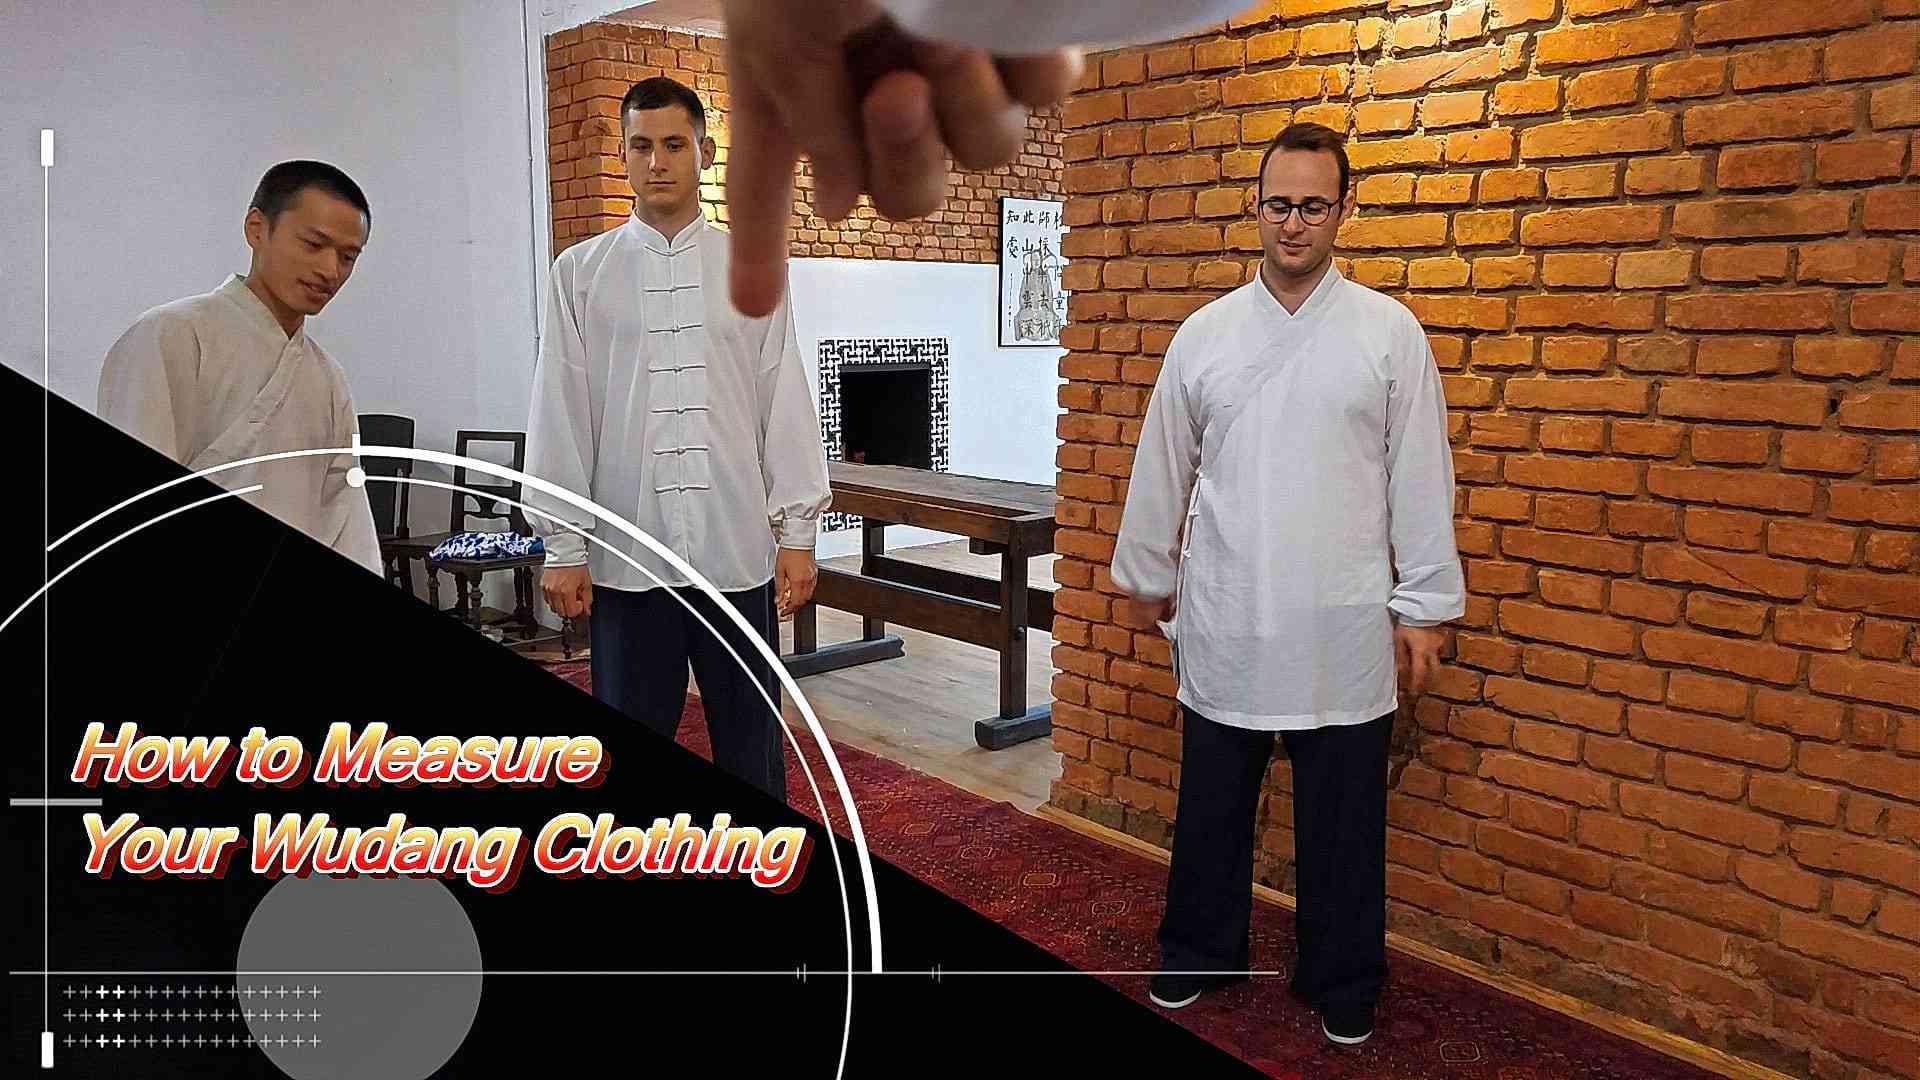 How to Measure Your Wudang School Uniform